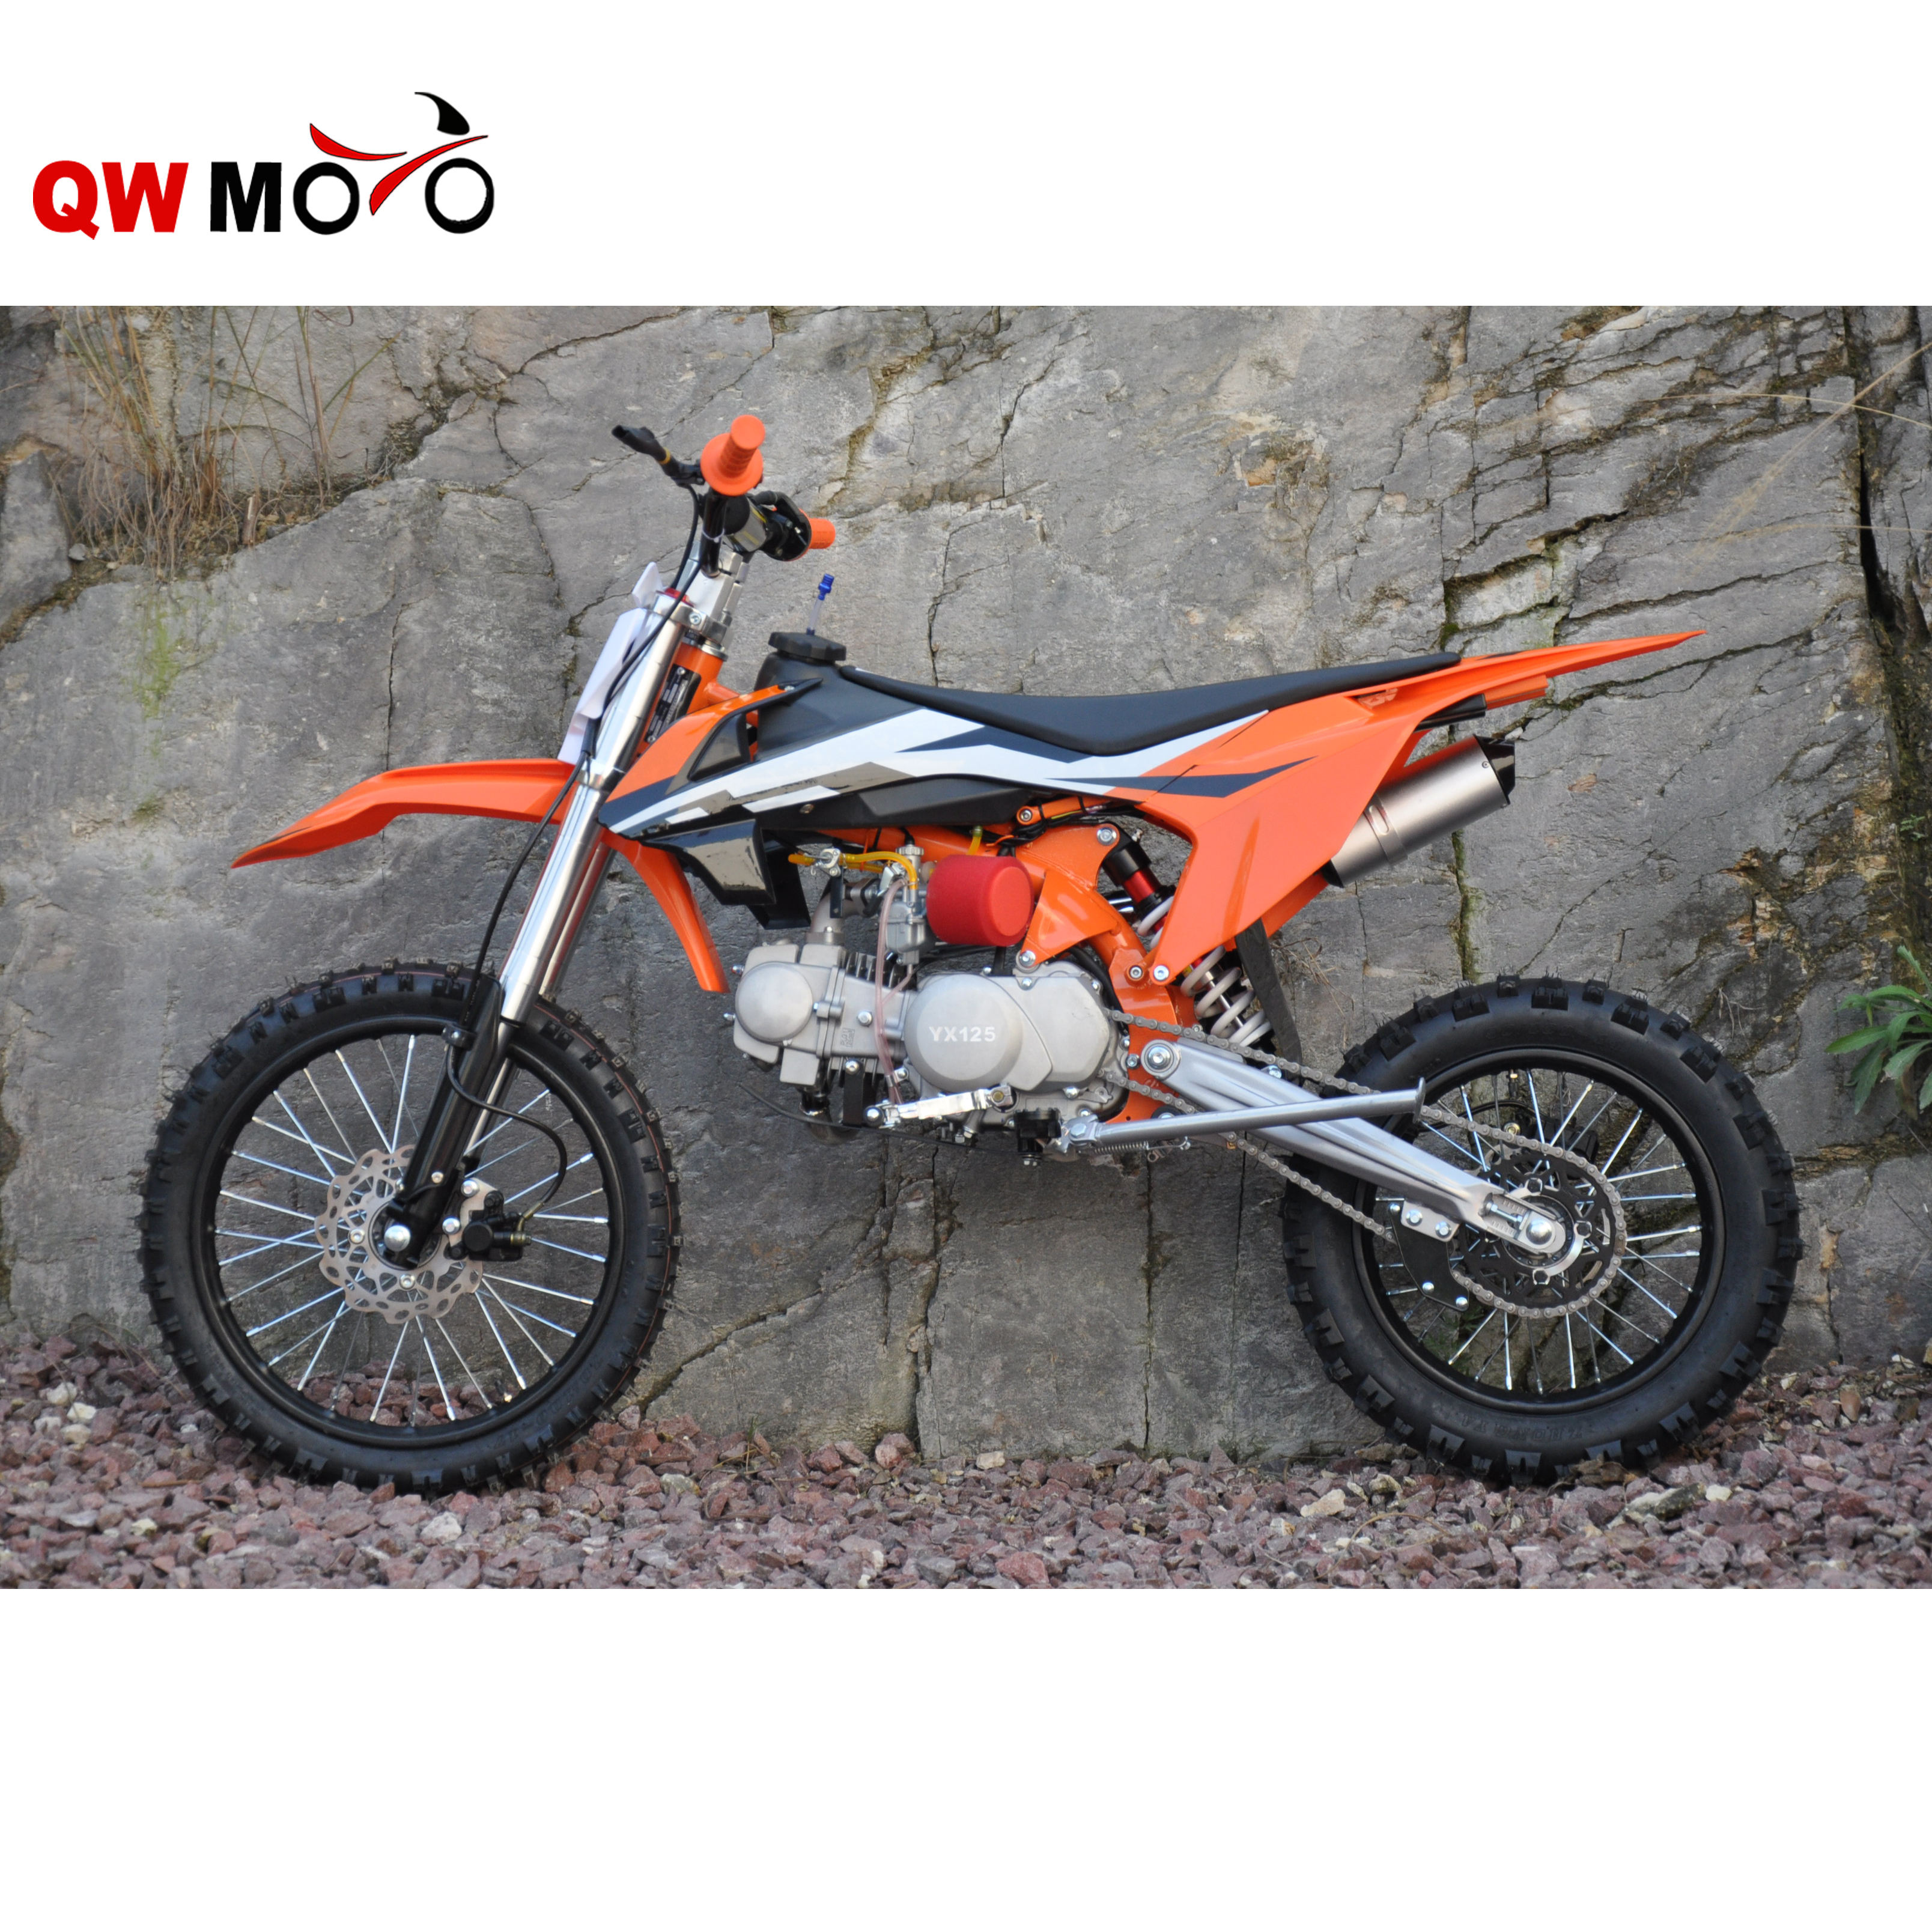 "13mm 8.5"" Kick Start Starter Lever 110cc 125 140cc PIT PRO Trail Dirt Bike ATV"